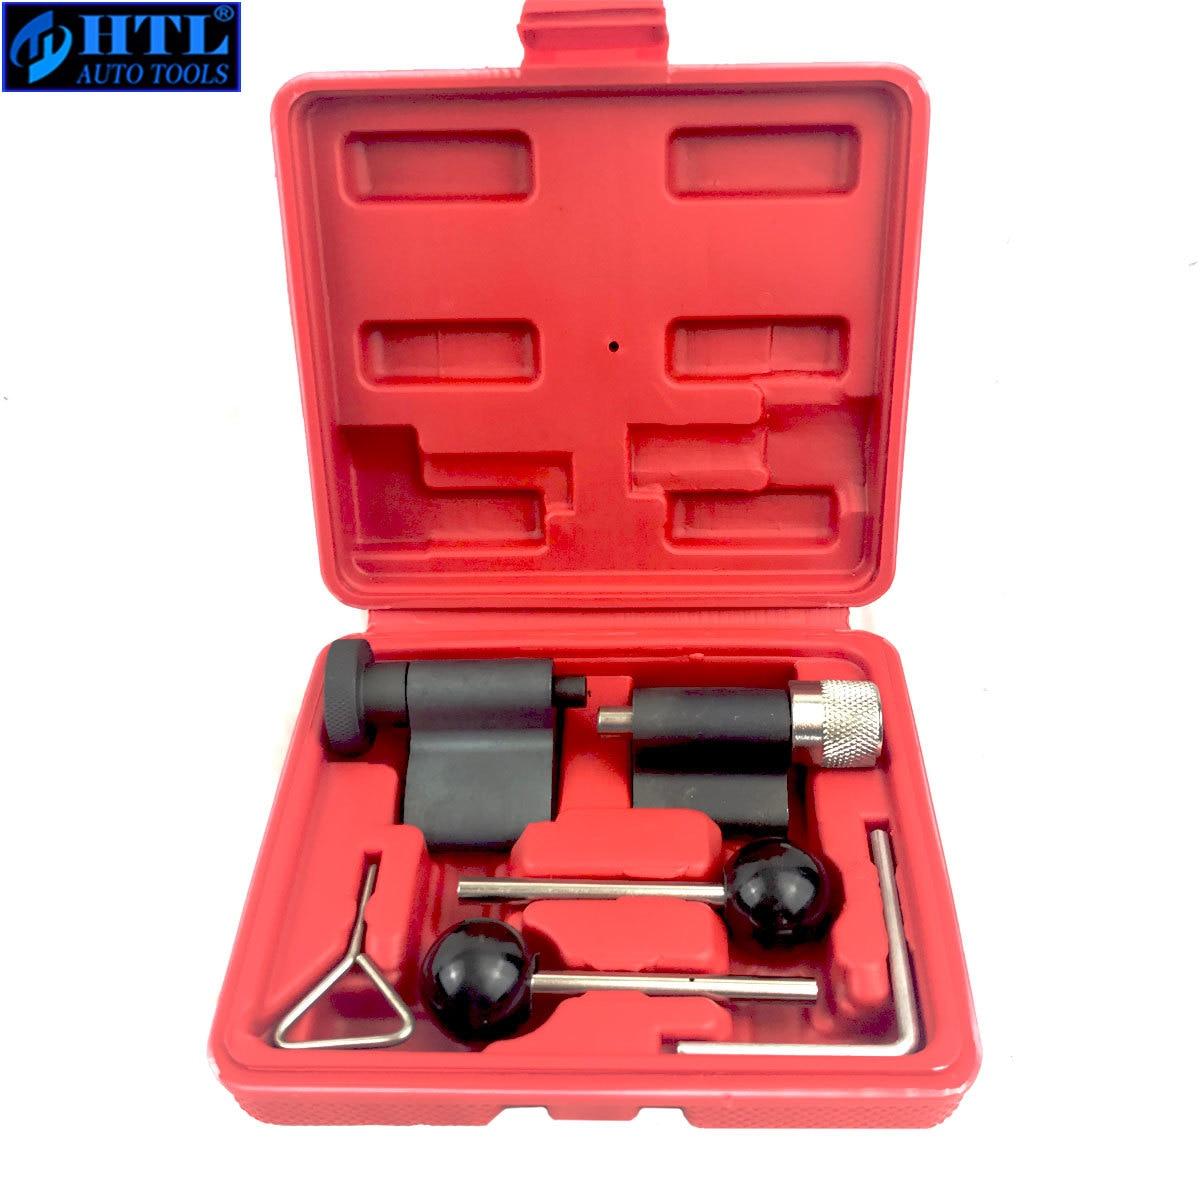 6pc Universal Diesel Engine Timing Cam Crank Locking Tool Set For VW AUDI T10050 T10100